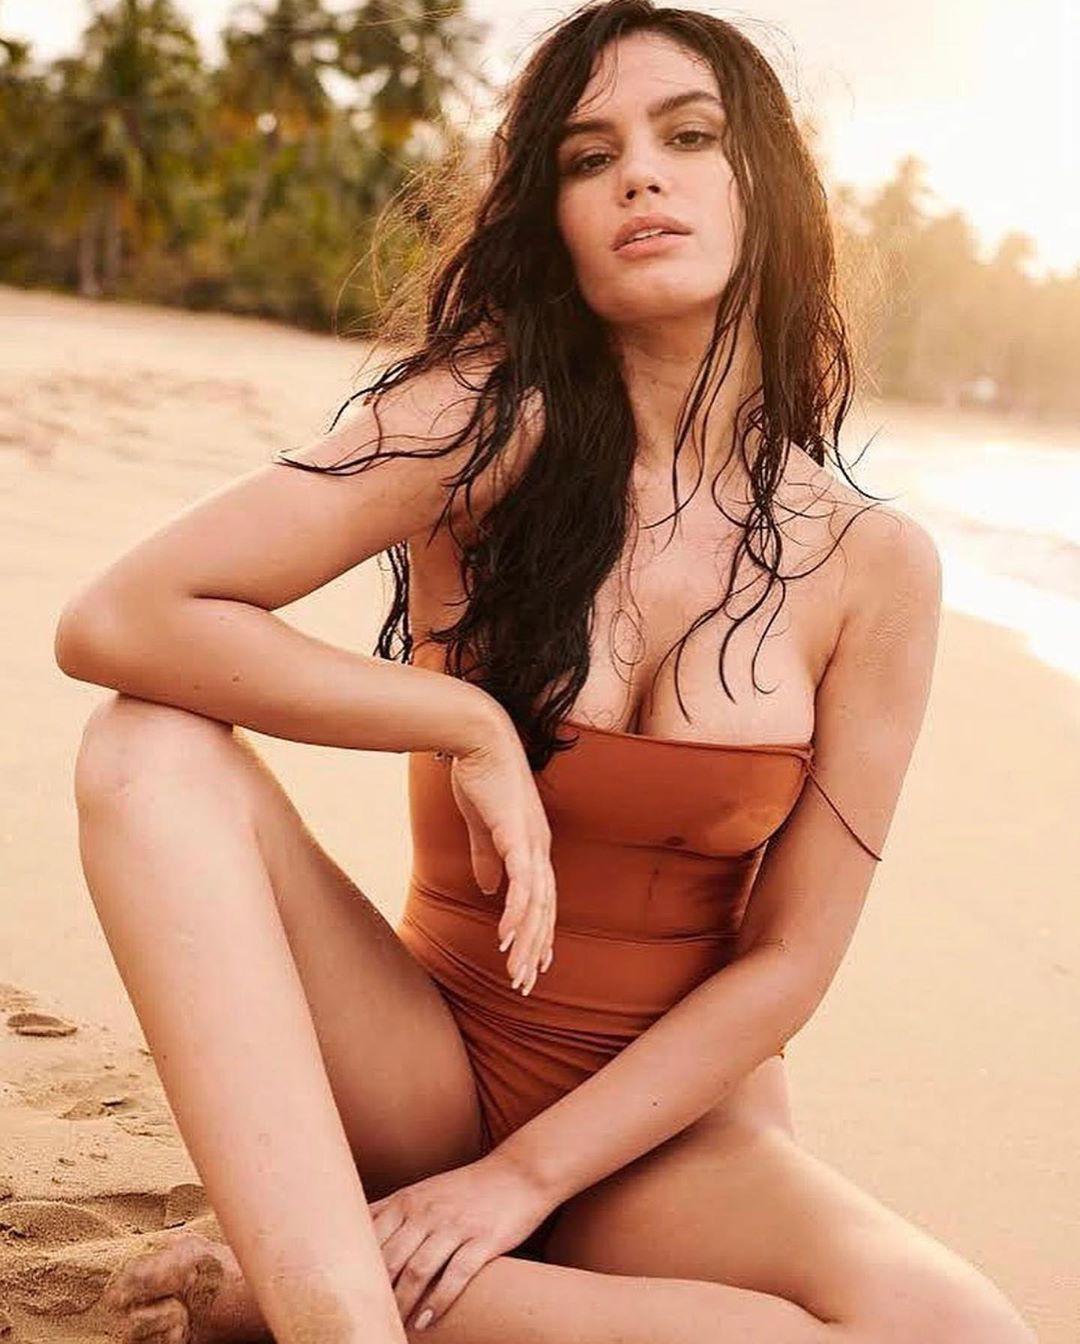 Anne De Paula lingerie, bikini dress for women, fashion photoshoot